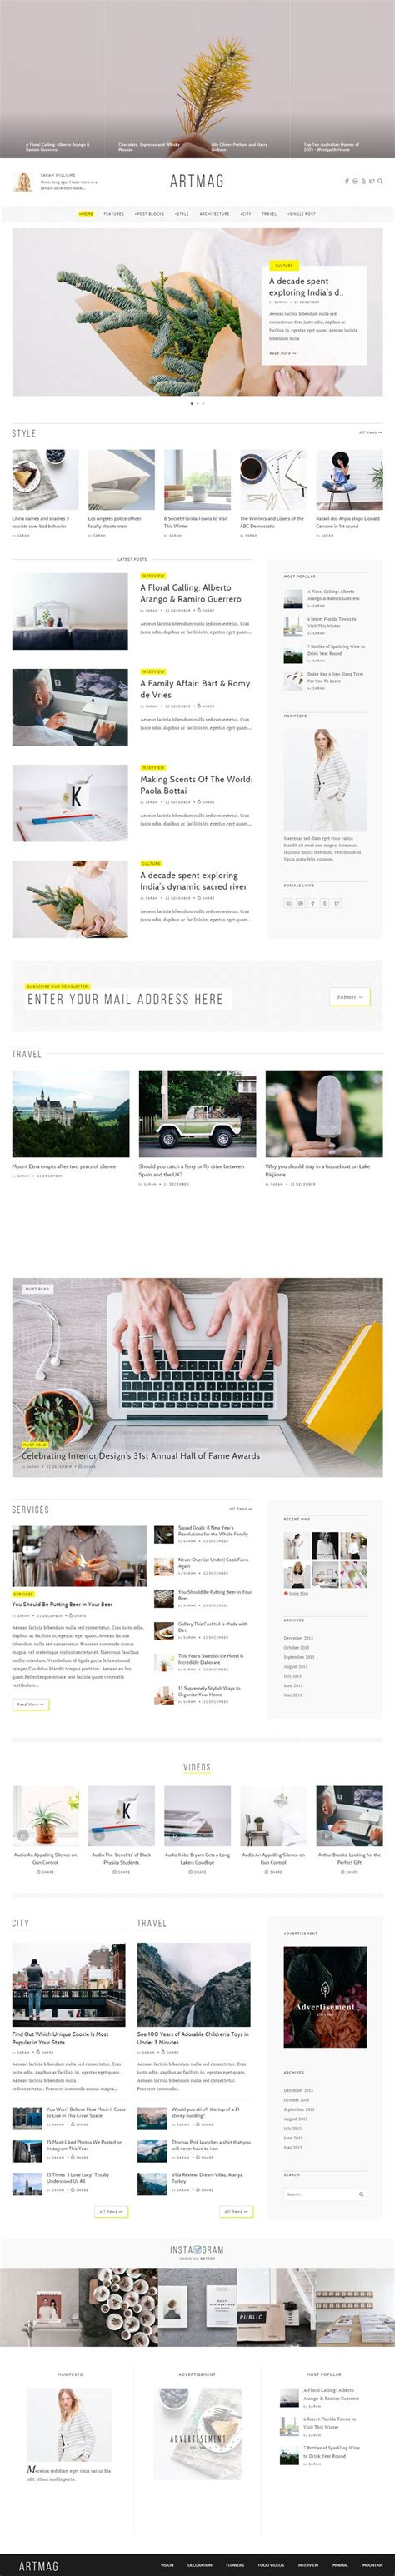 magazine layout bootstrap 25 best ideas about magazine titles on pinterest